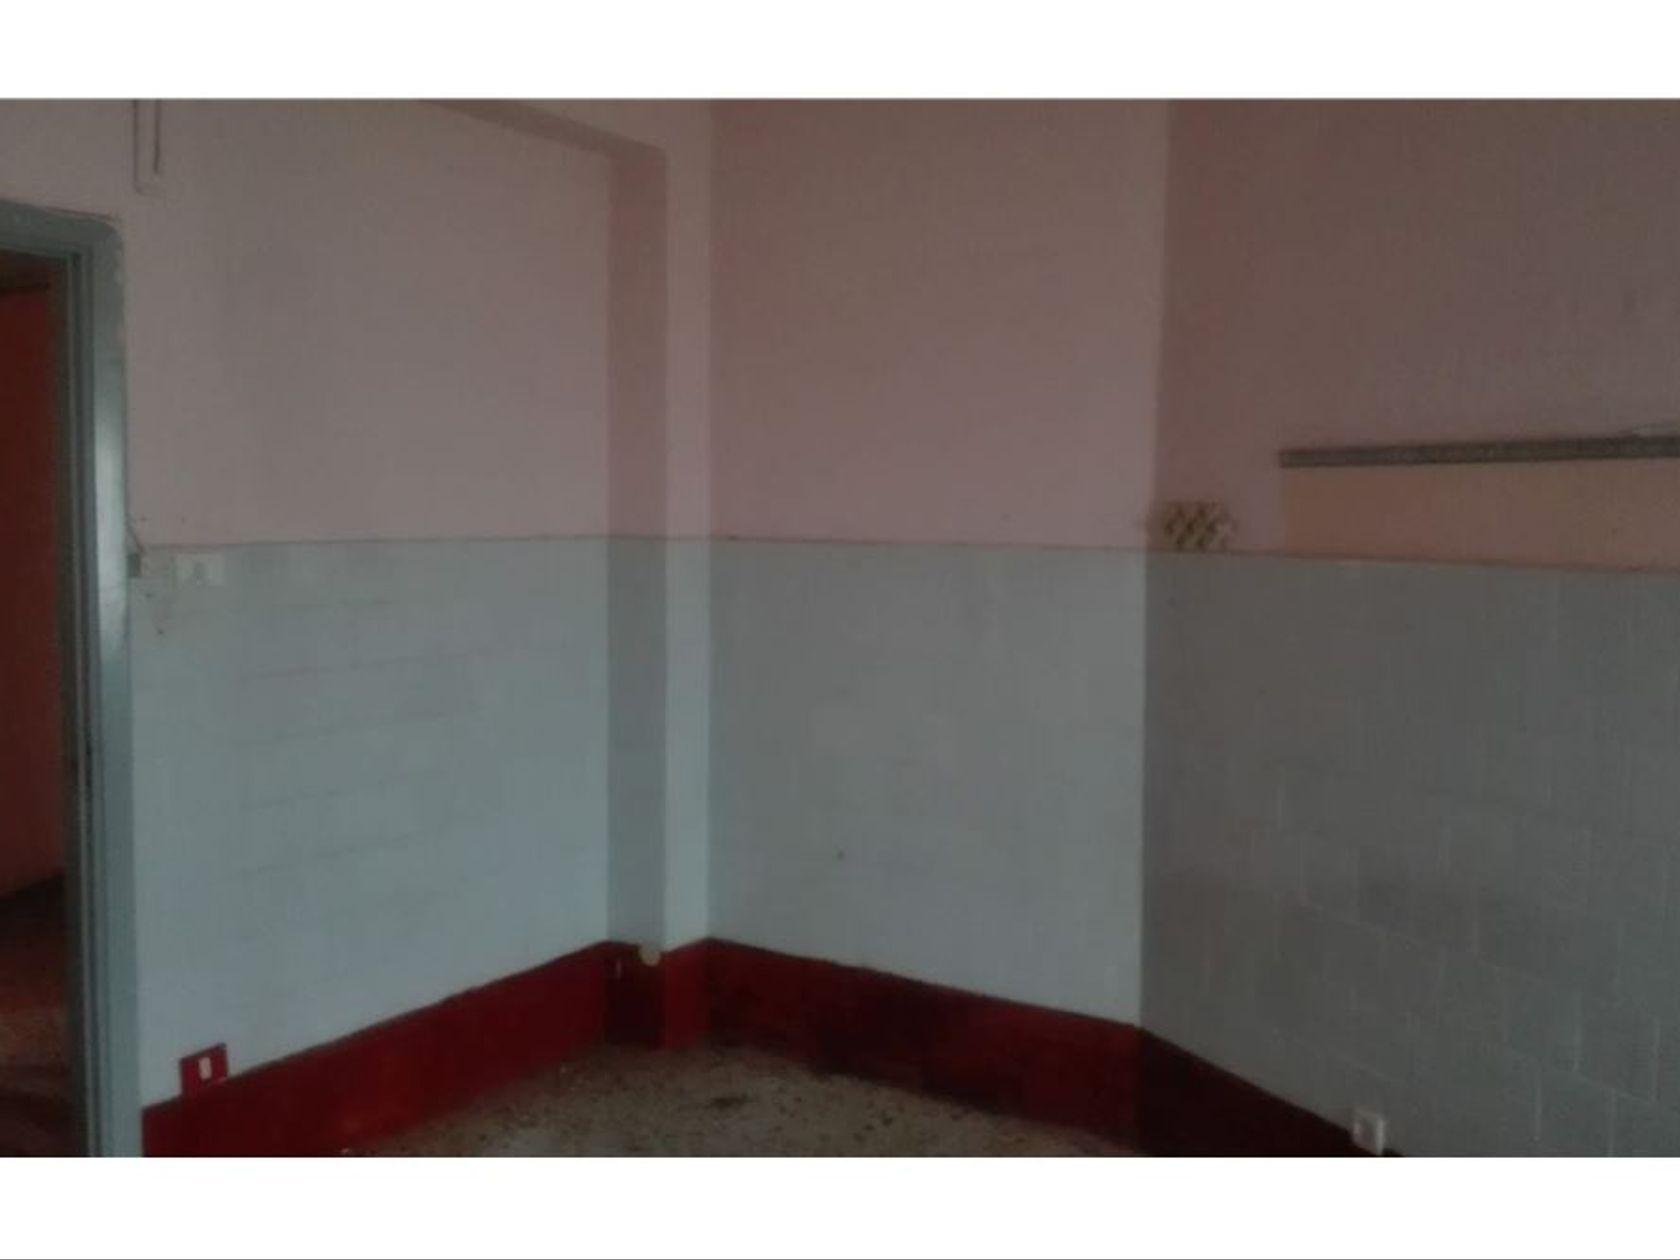 Appartamento Santa Maria, Catanzaro, CZ Vendita - Foto 19